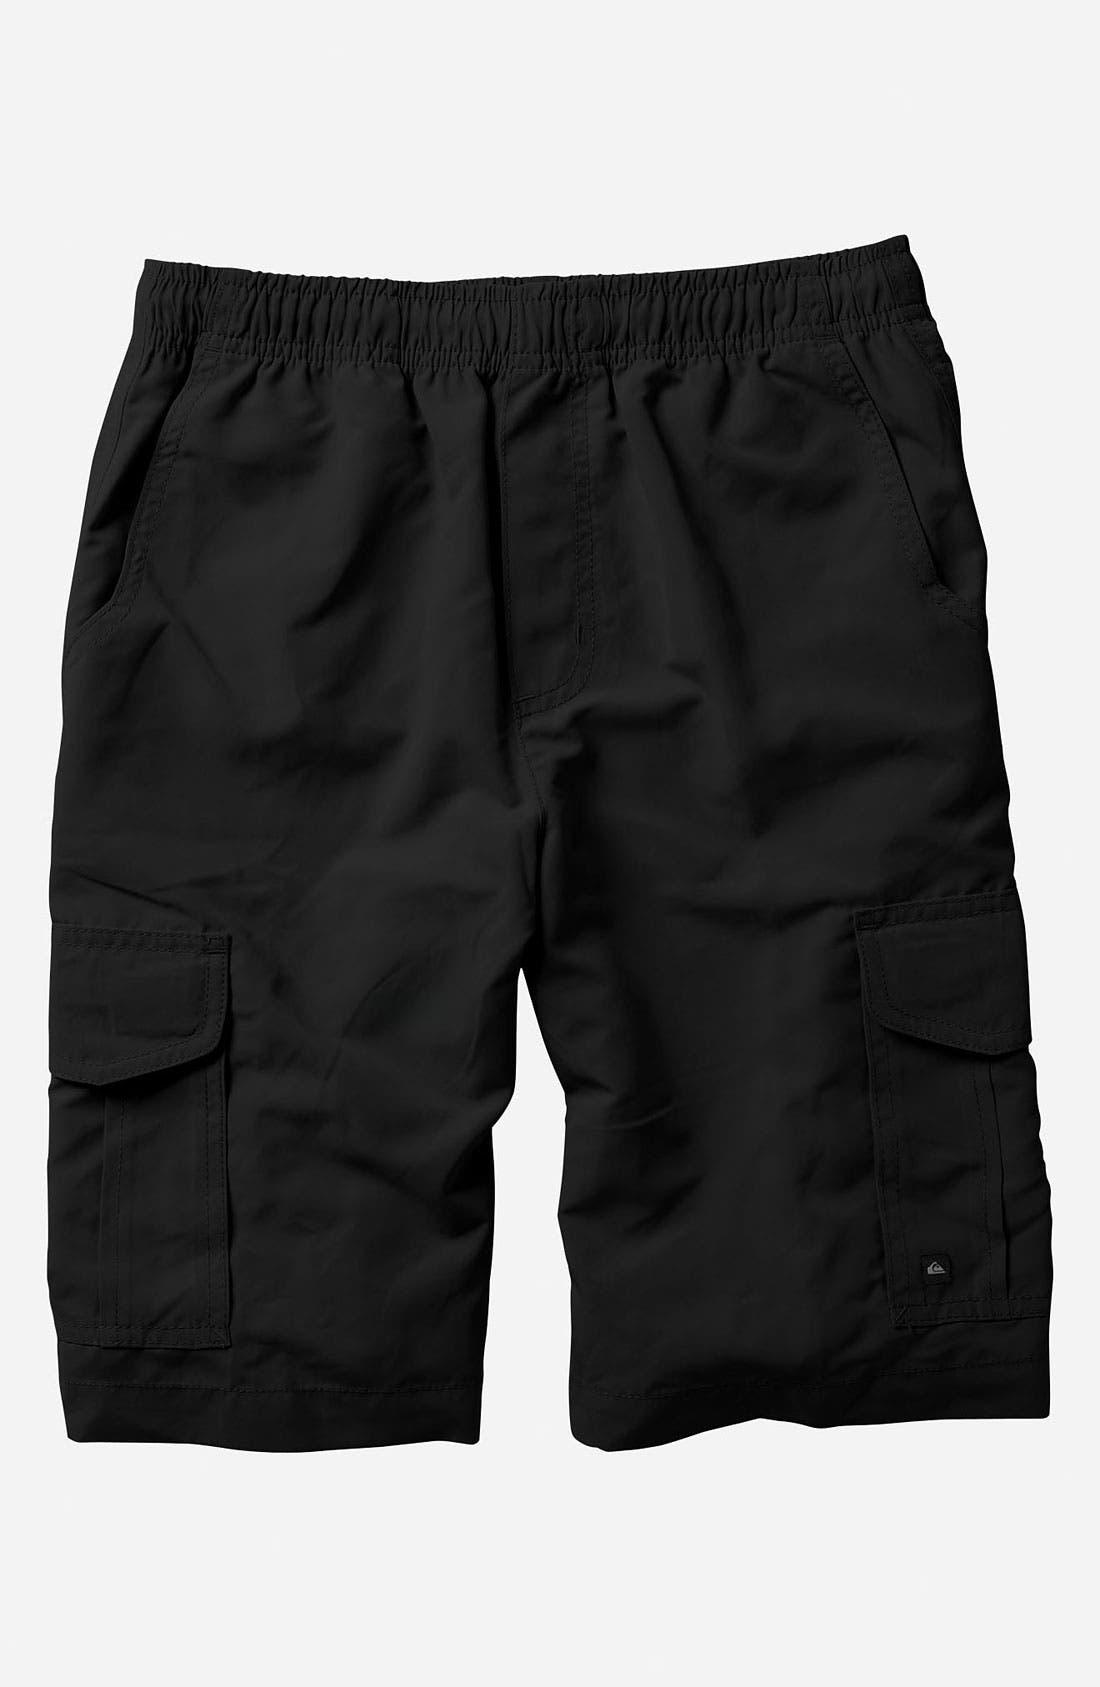 Main Image - Quiksilver 'Stylo' Cargo Shorts (Big Boys)